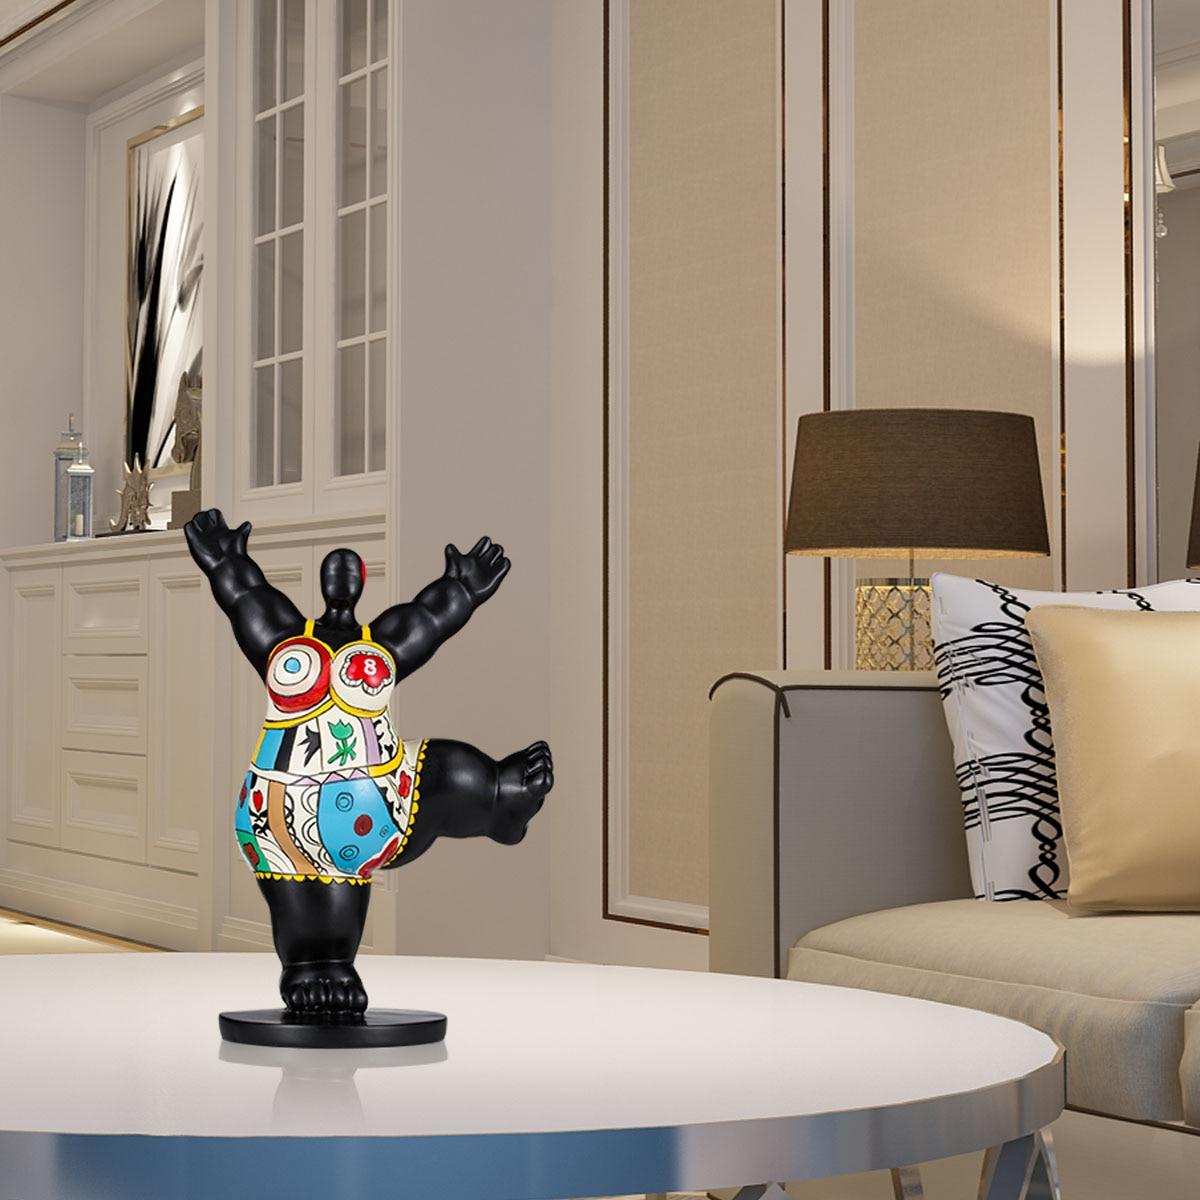 Energetic Gym Fat Woman Fiberglass Sculpture Exaggerative Modeling Home Tabletop Room Book Shelf Decorativee Ornament Sculpture